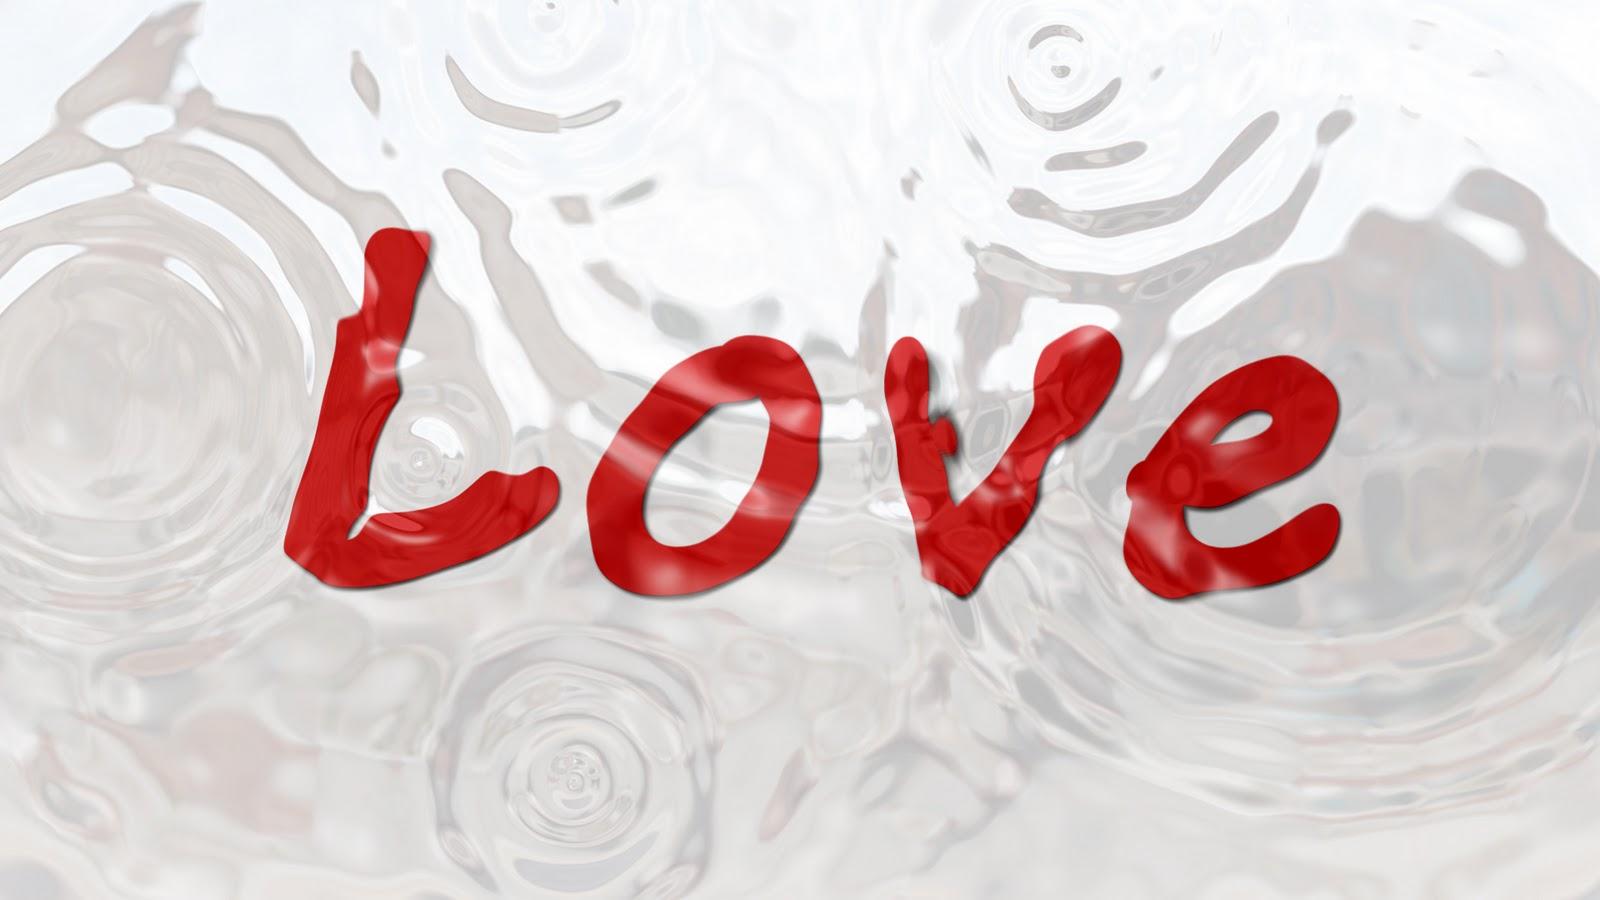 Wallpaper Hd Love: Labels: Love Wallpapers Hd 1080p